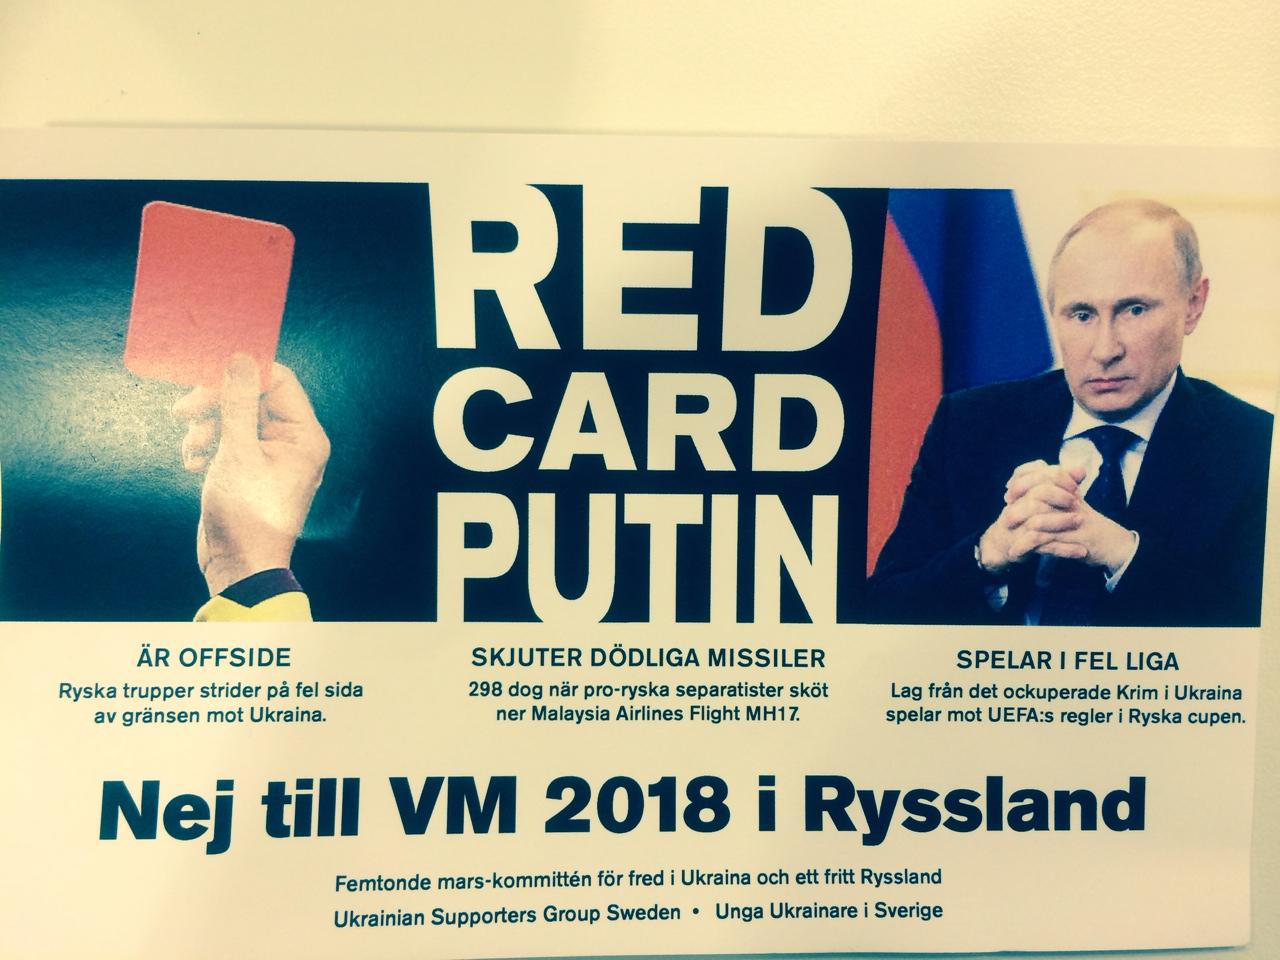 Акция против политики Путина